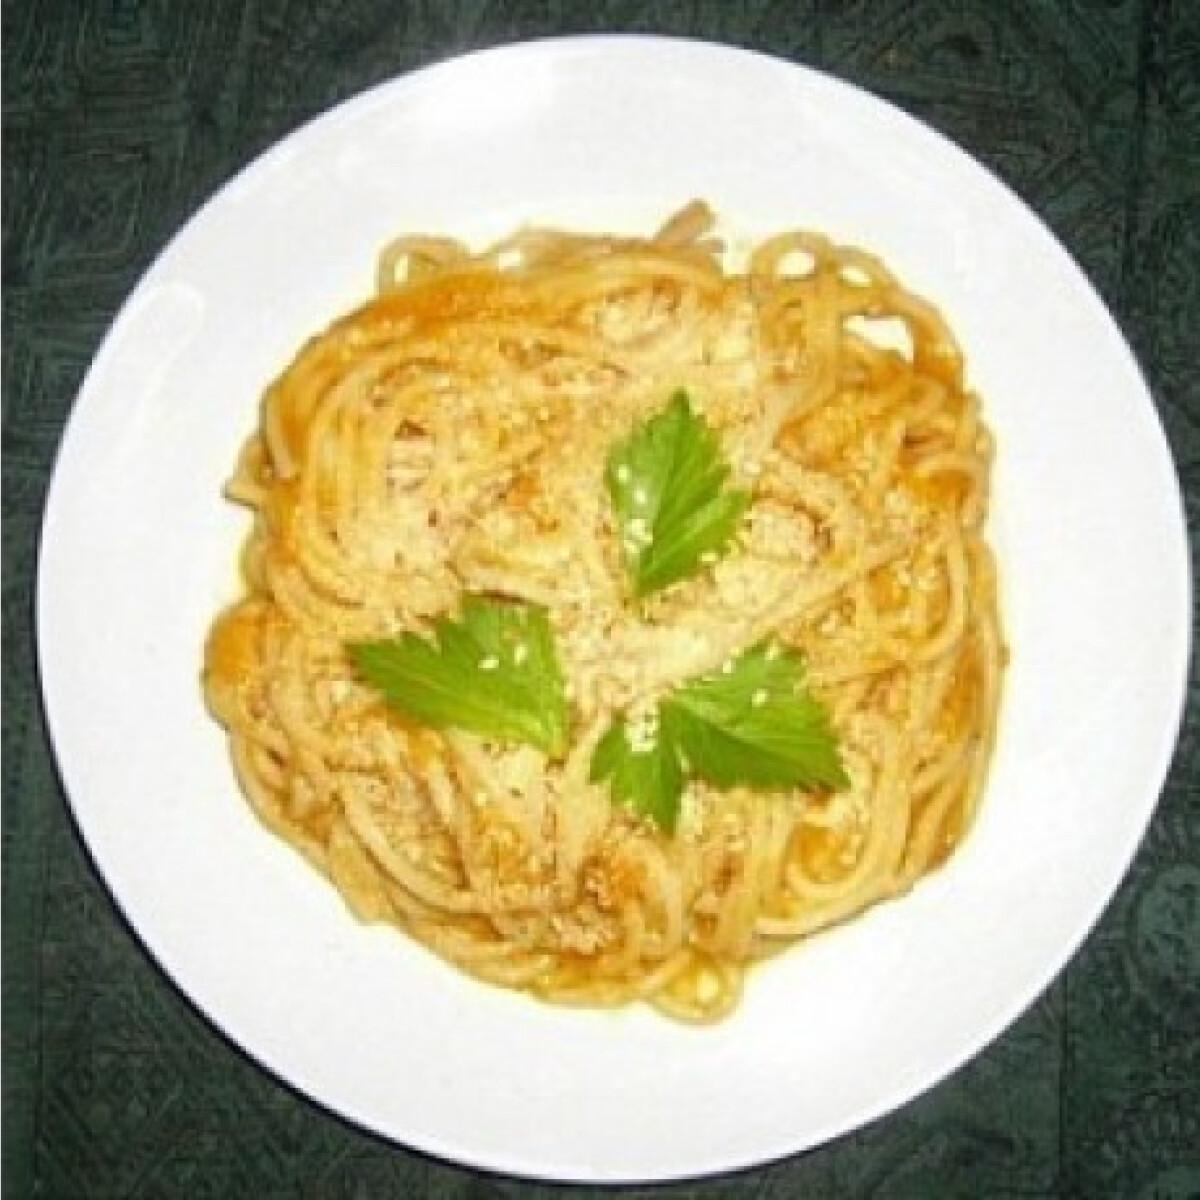 Ezen a képen: Sütőtökös-sajtos spagetti 2. - sütőtökkrémlevesből